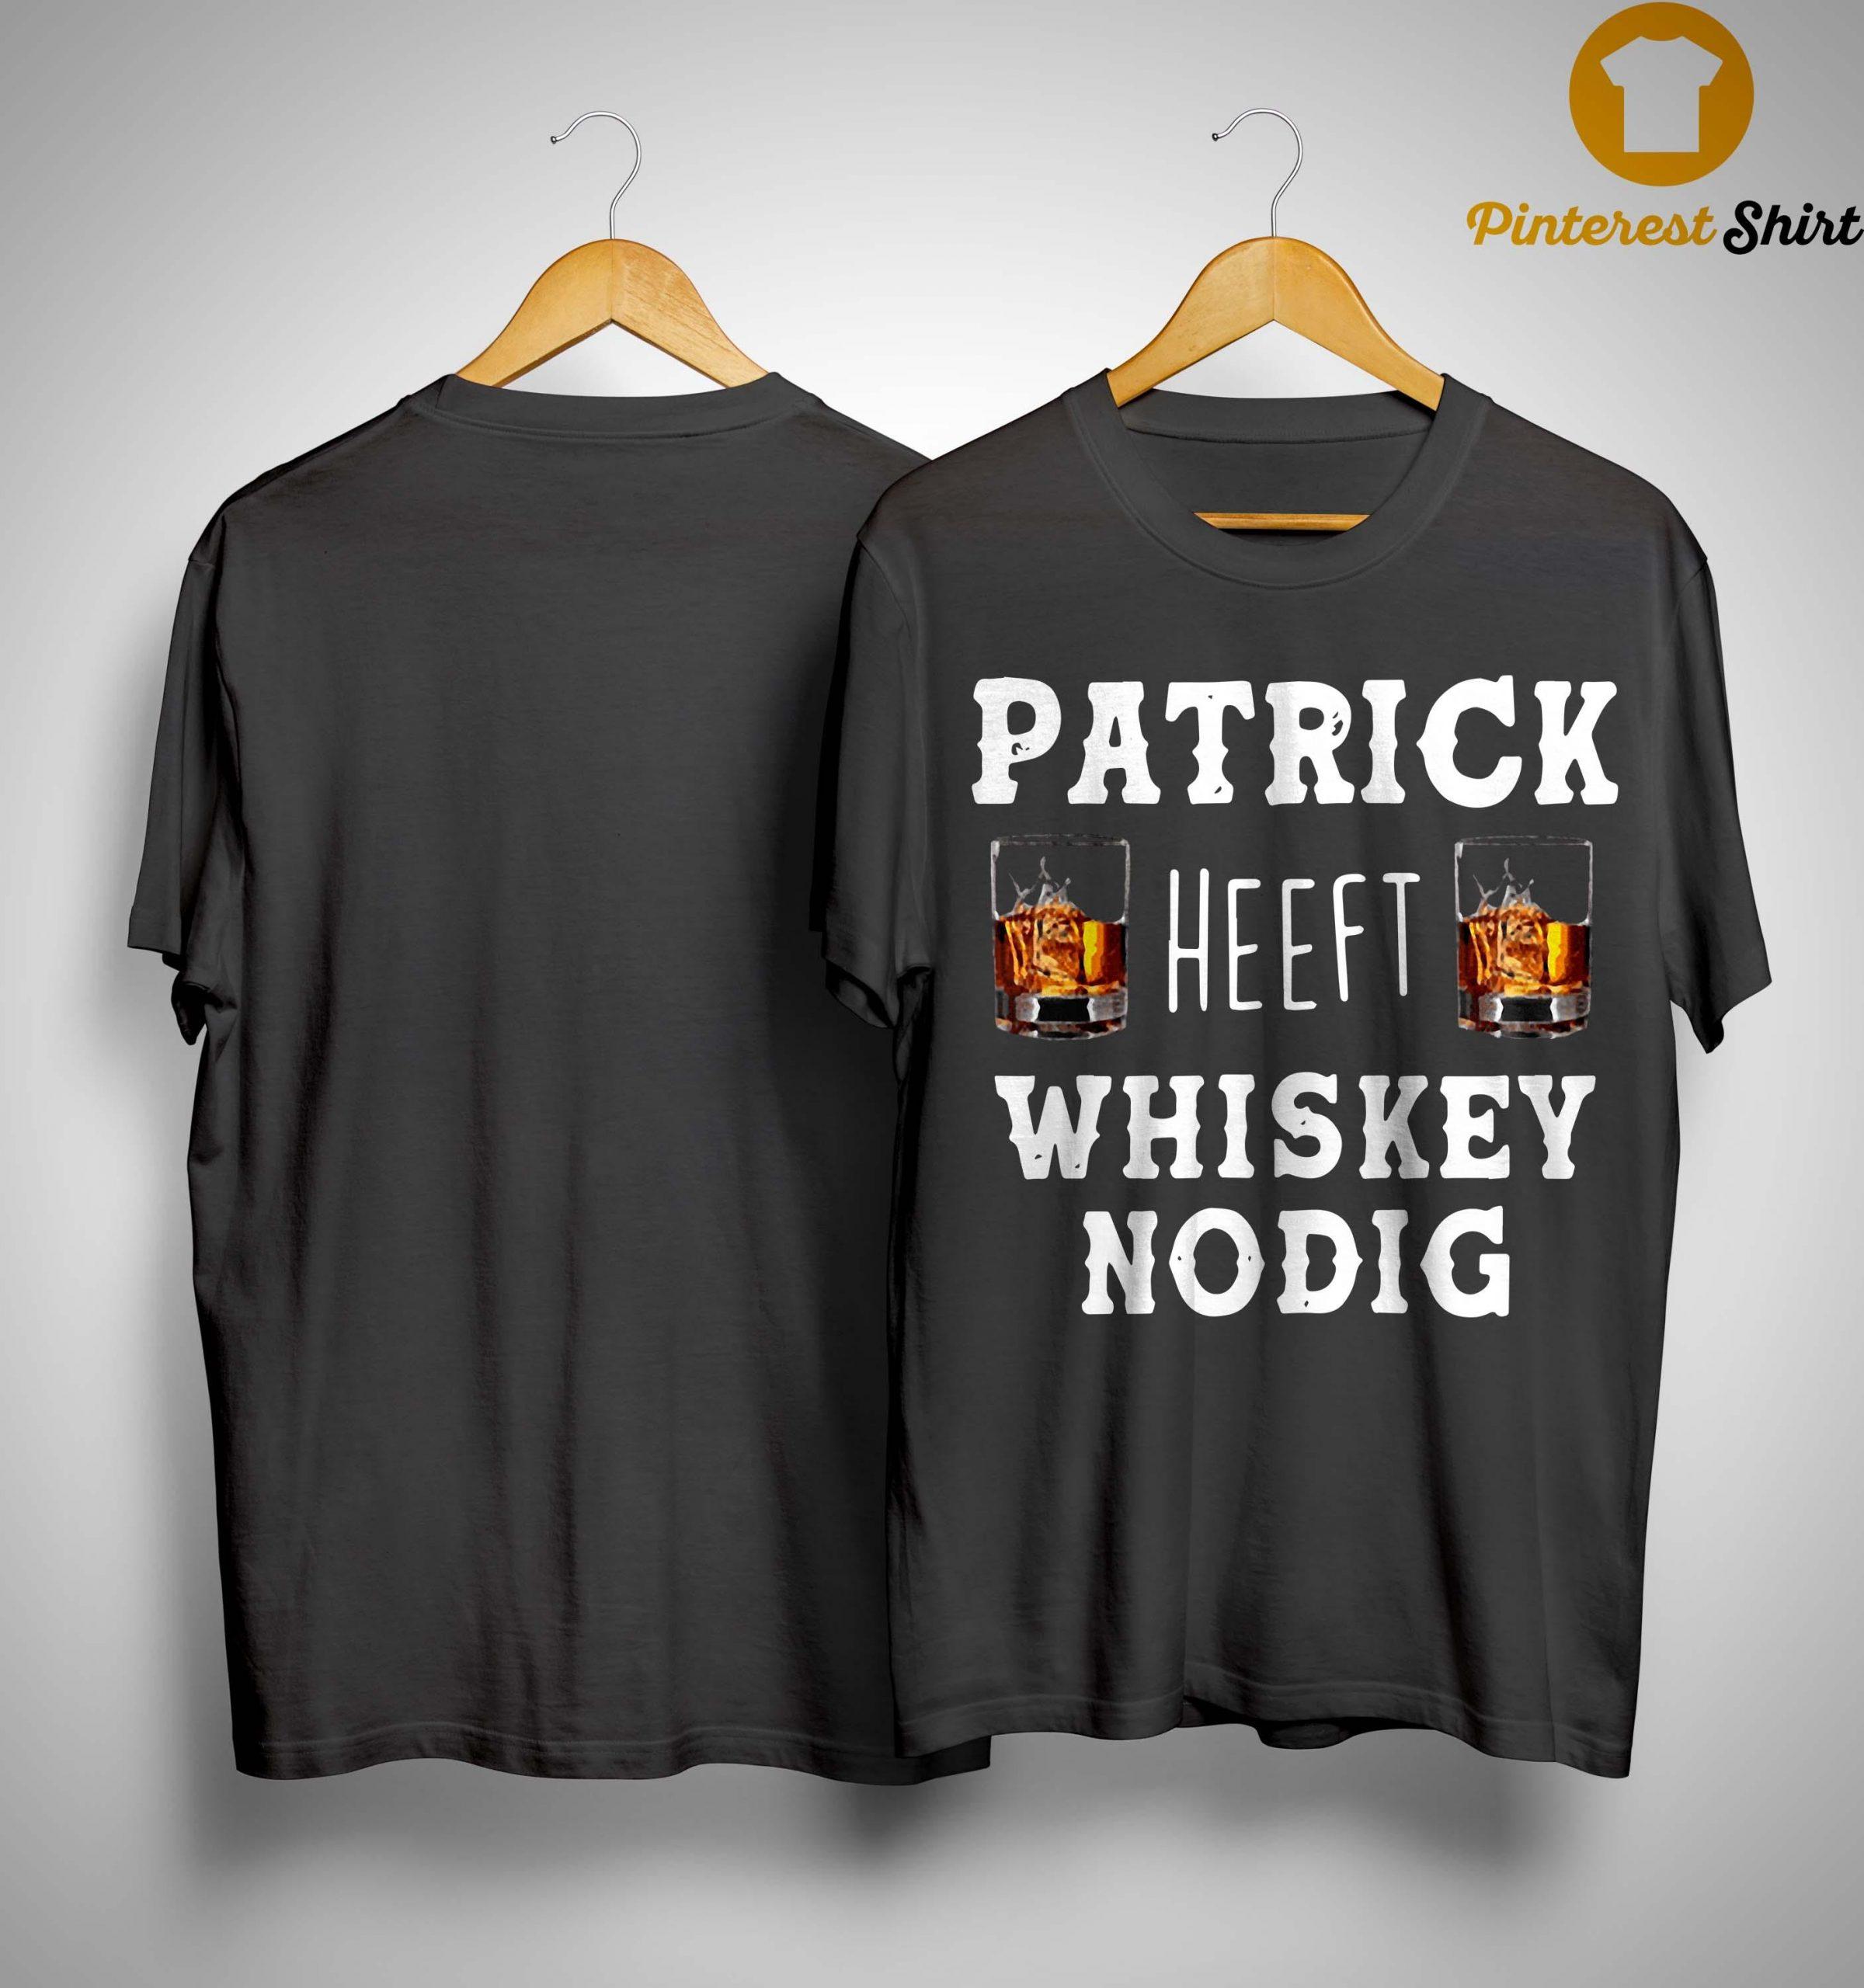 Patrick Heeft Whiskey Nodig Shirt